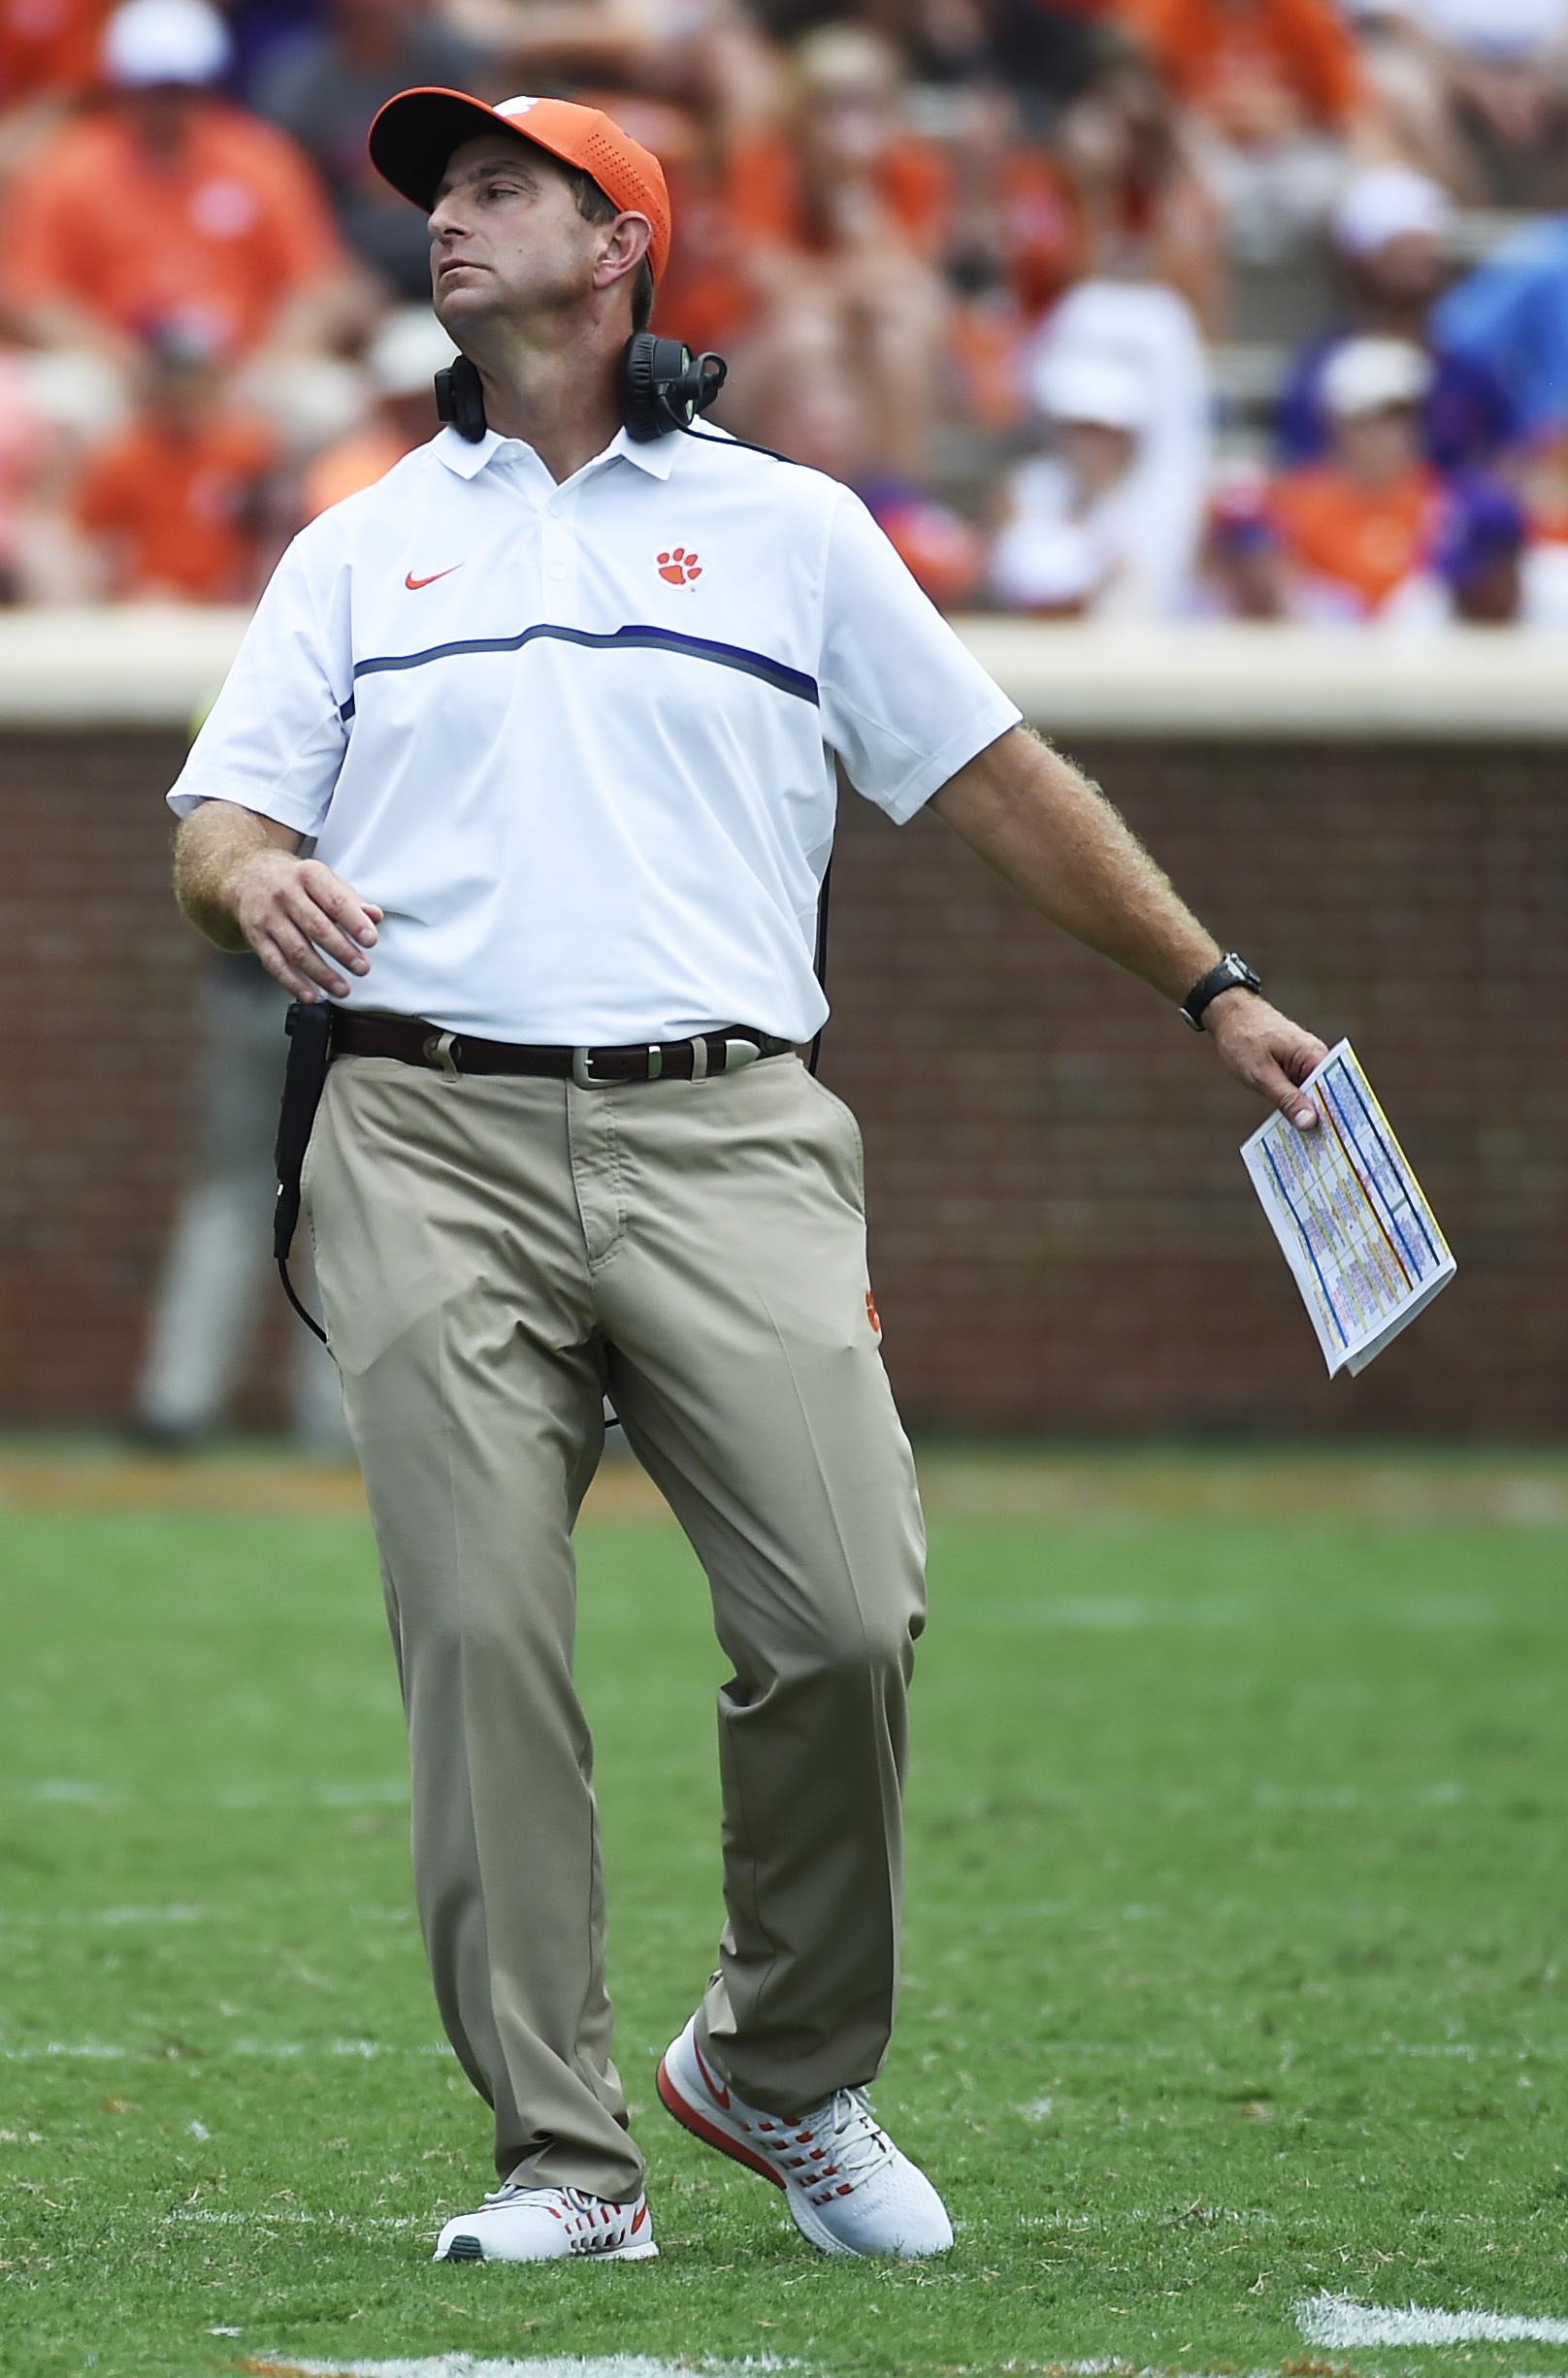 Clemson head coach Dabo Swinney reacts to a call during the second half an NCAA college football game against Troy on Saturday, Sept. 10, 2016, in Clemson, S.C. Clemson won 30-24. (AP Photo/Rainier Ehrhardt)